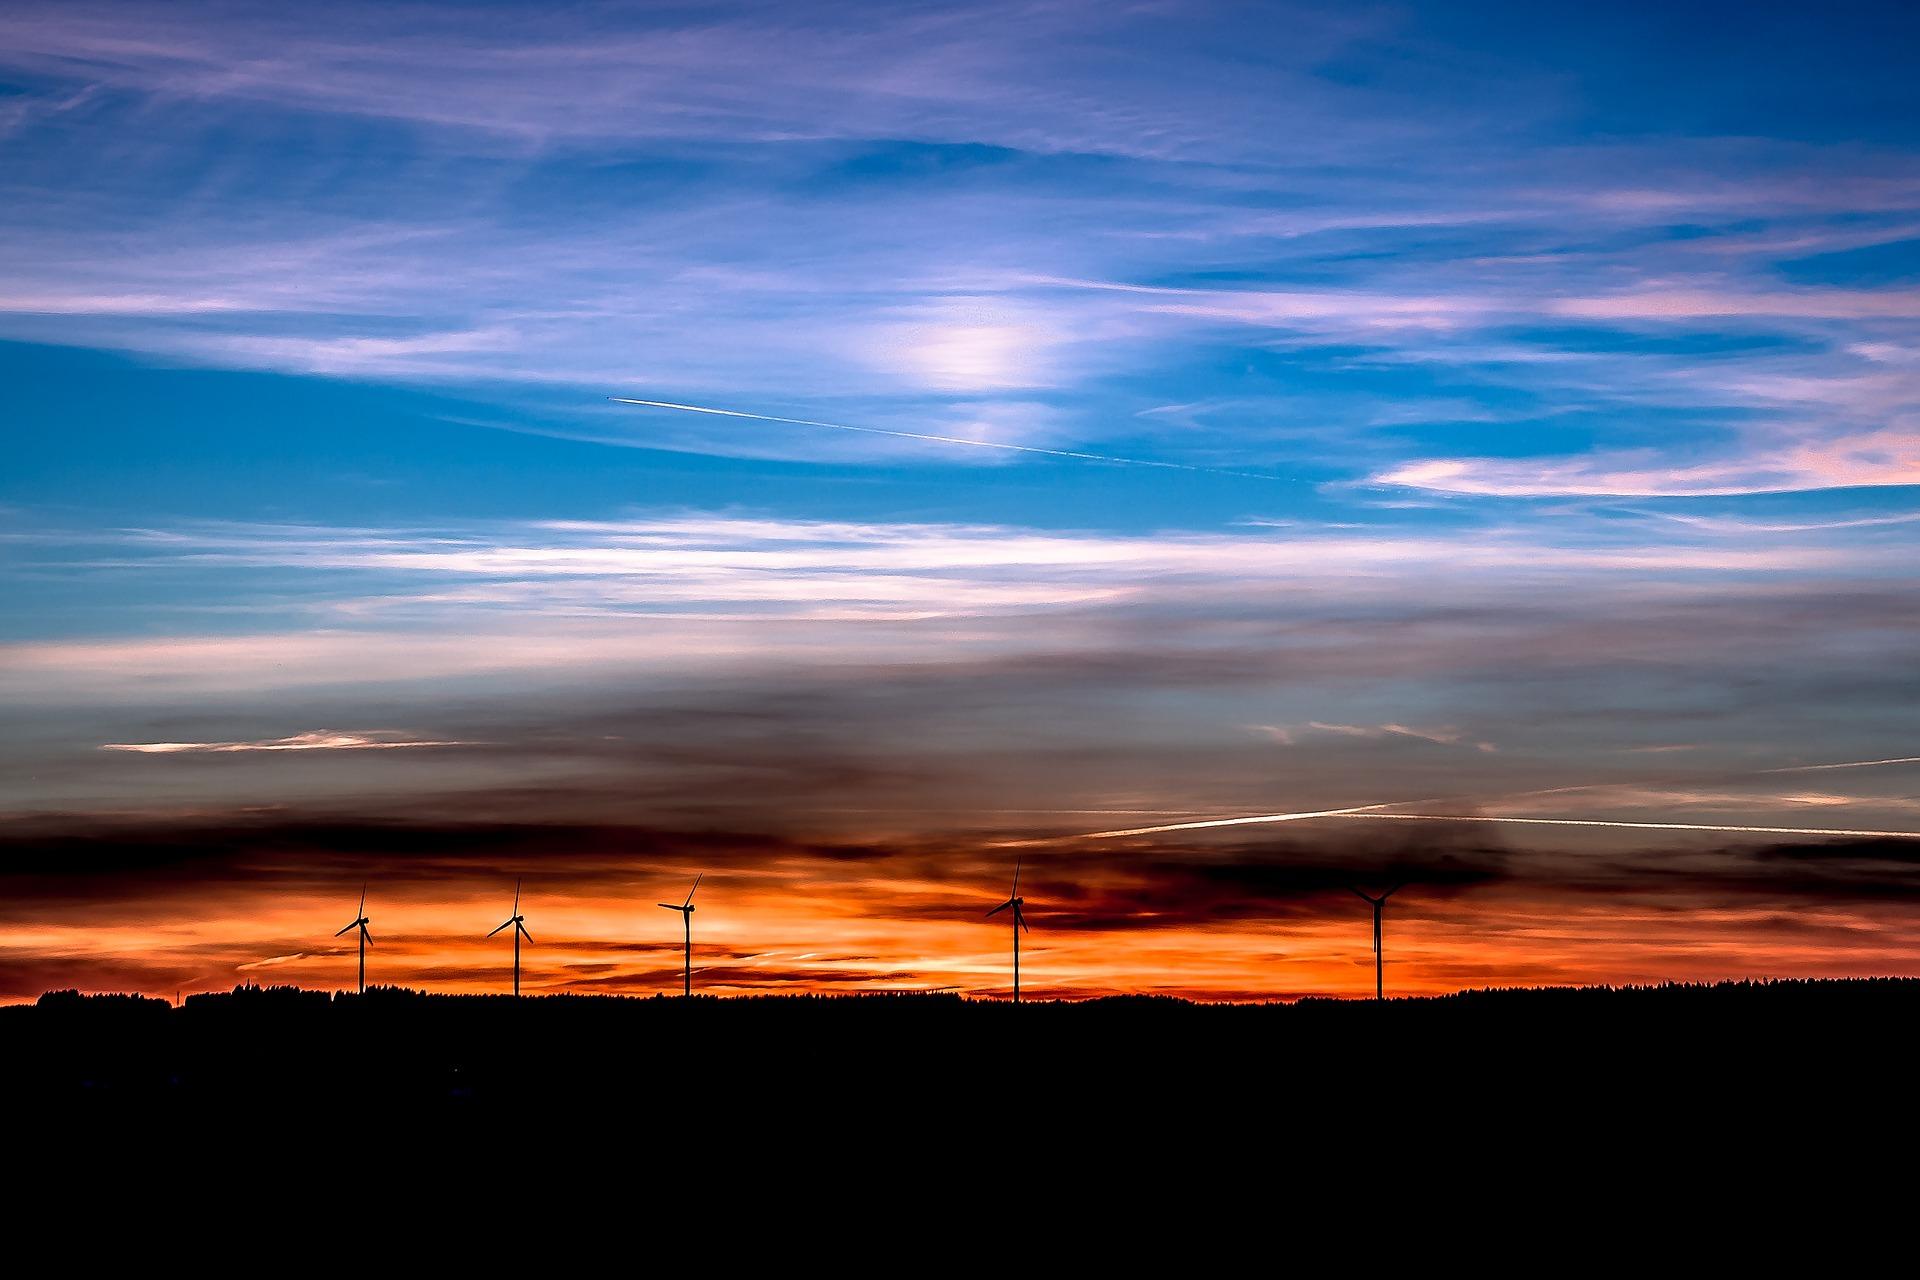 sunset-1786475_1920